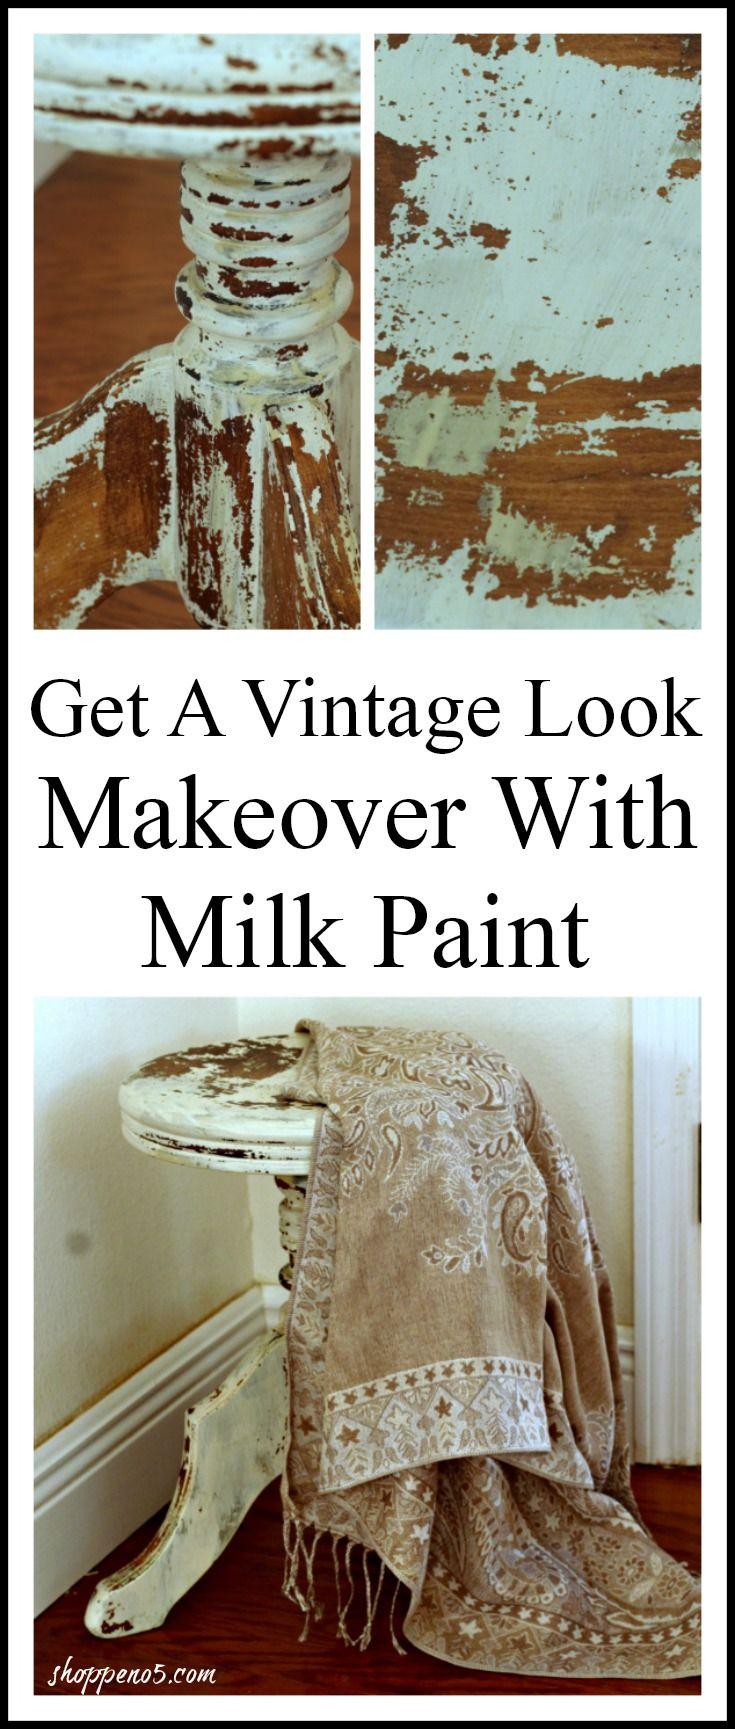 Get A Vintage Look Makeover With Milk PaintEdit description